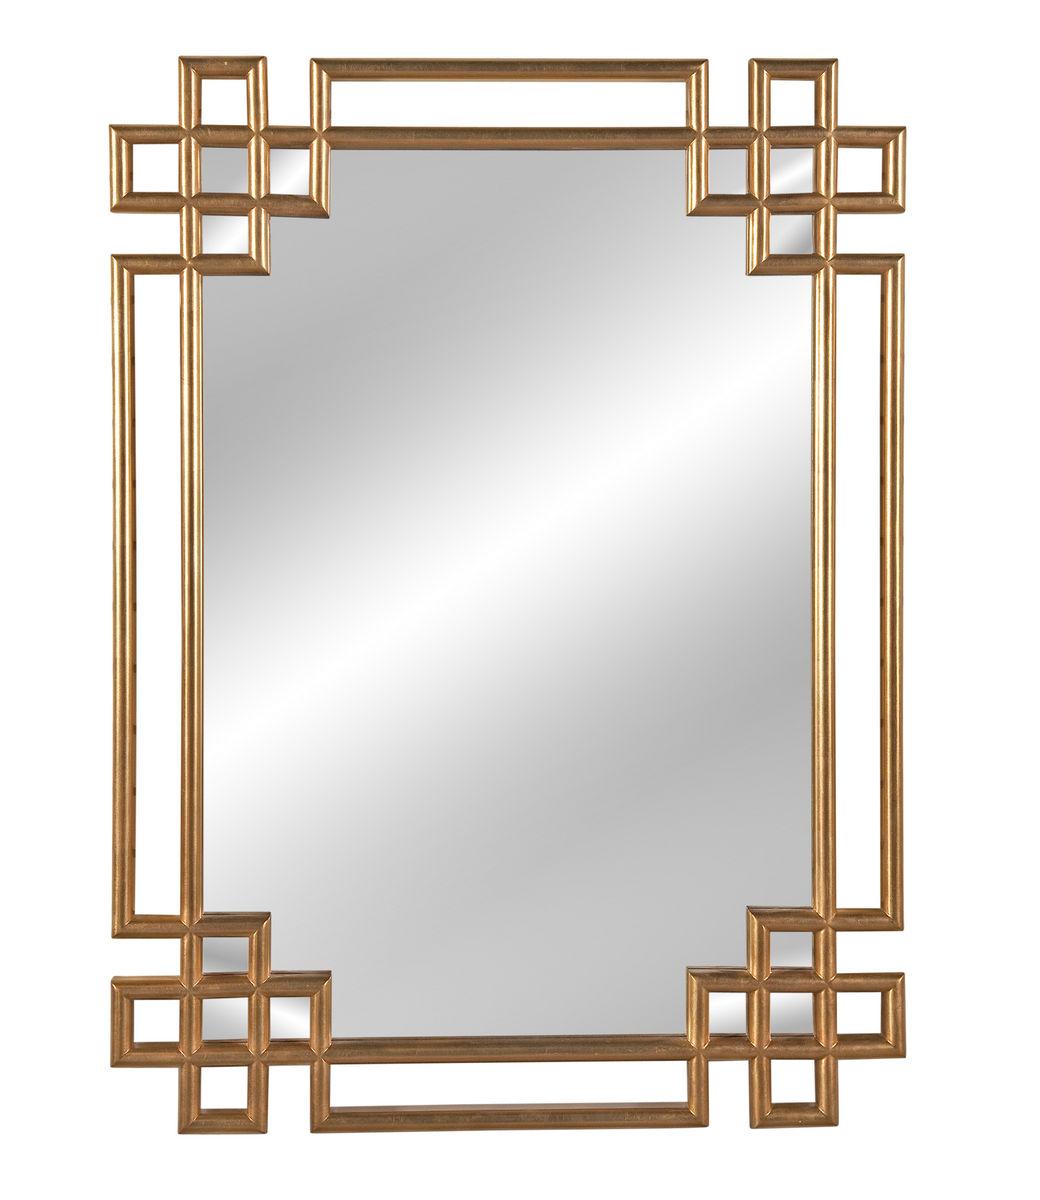 Frederick Wall Mirror Antique Gold Leaf 34 X 48h